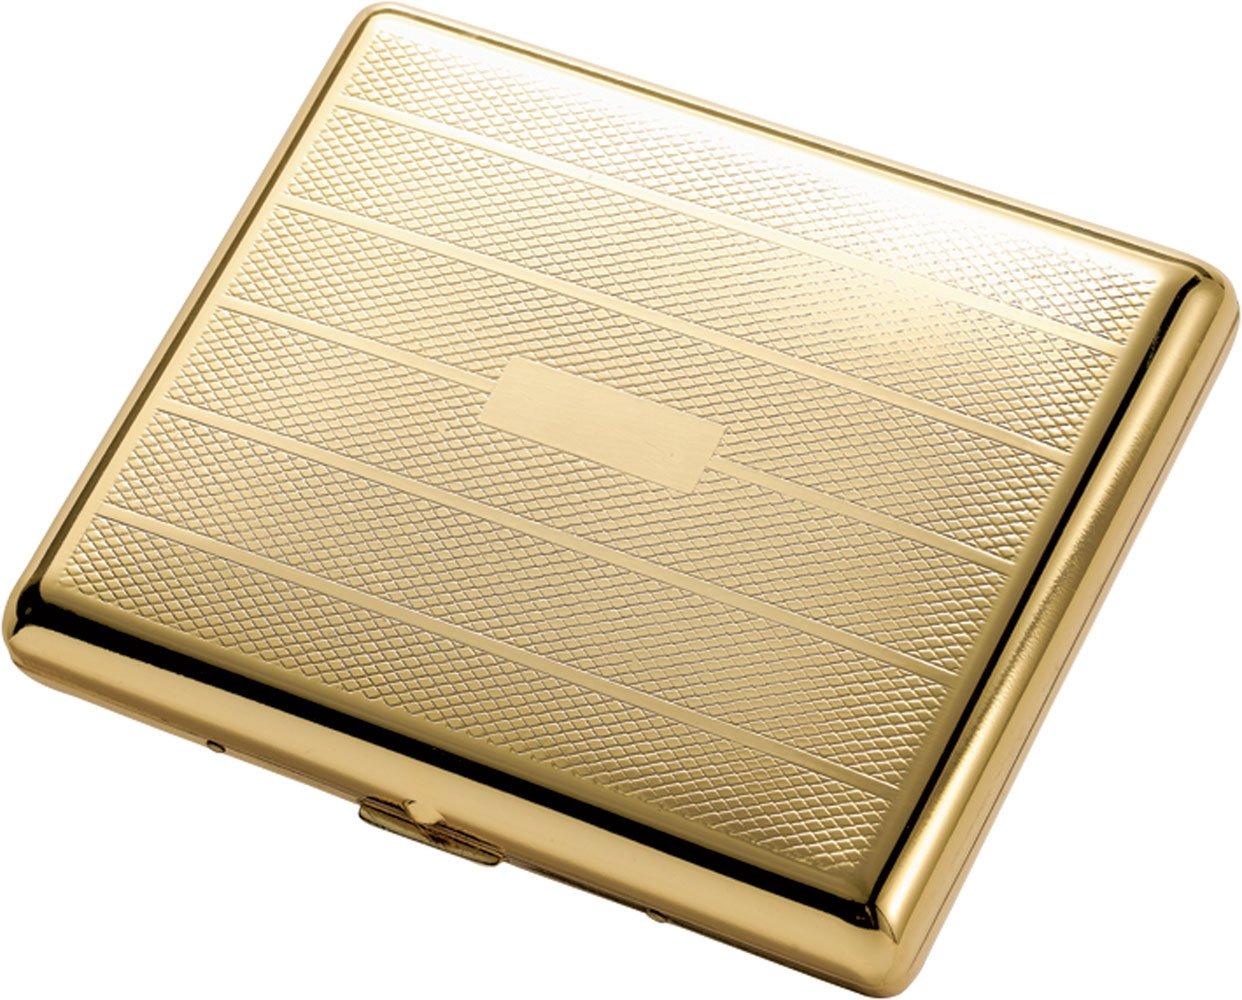 Visol Products Pierre Polished Cigarette Case, Gold